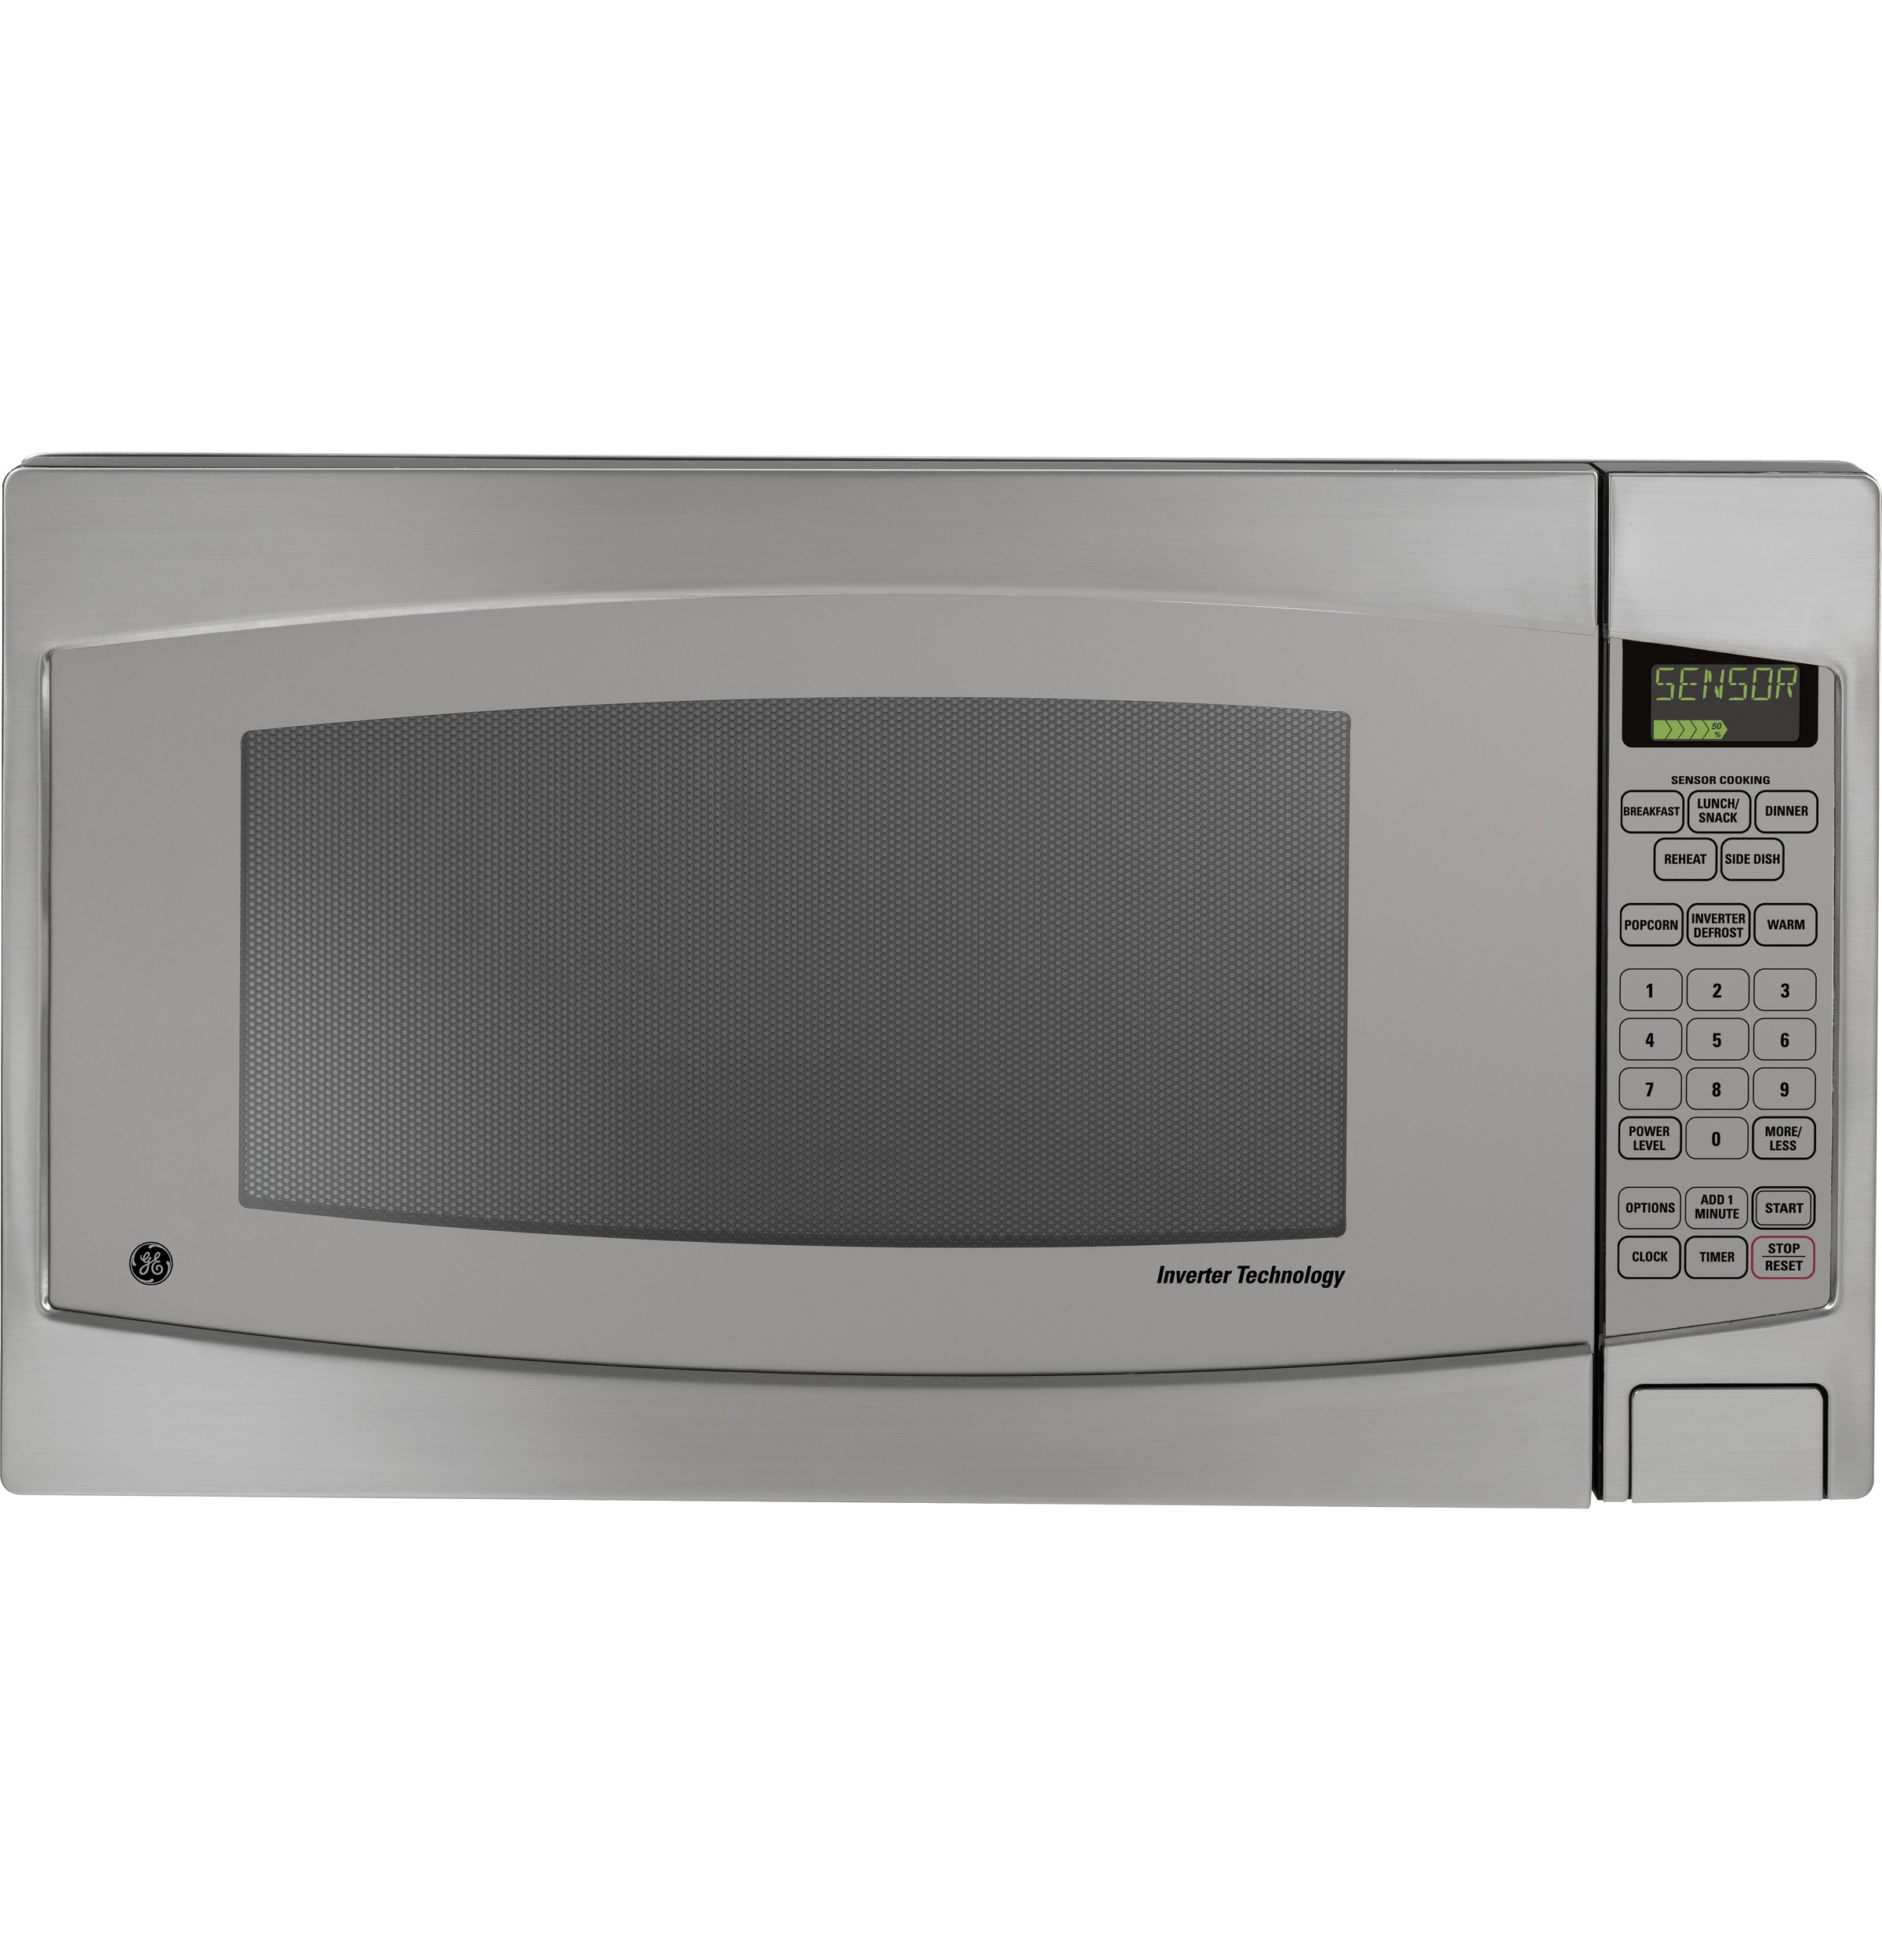 Ge Microwave Ovens Countertop: GE Profile 2.2 Cu. Ft. Countertop Microwave Oven W/ Child